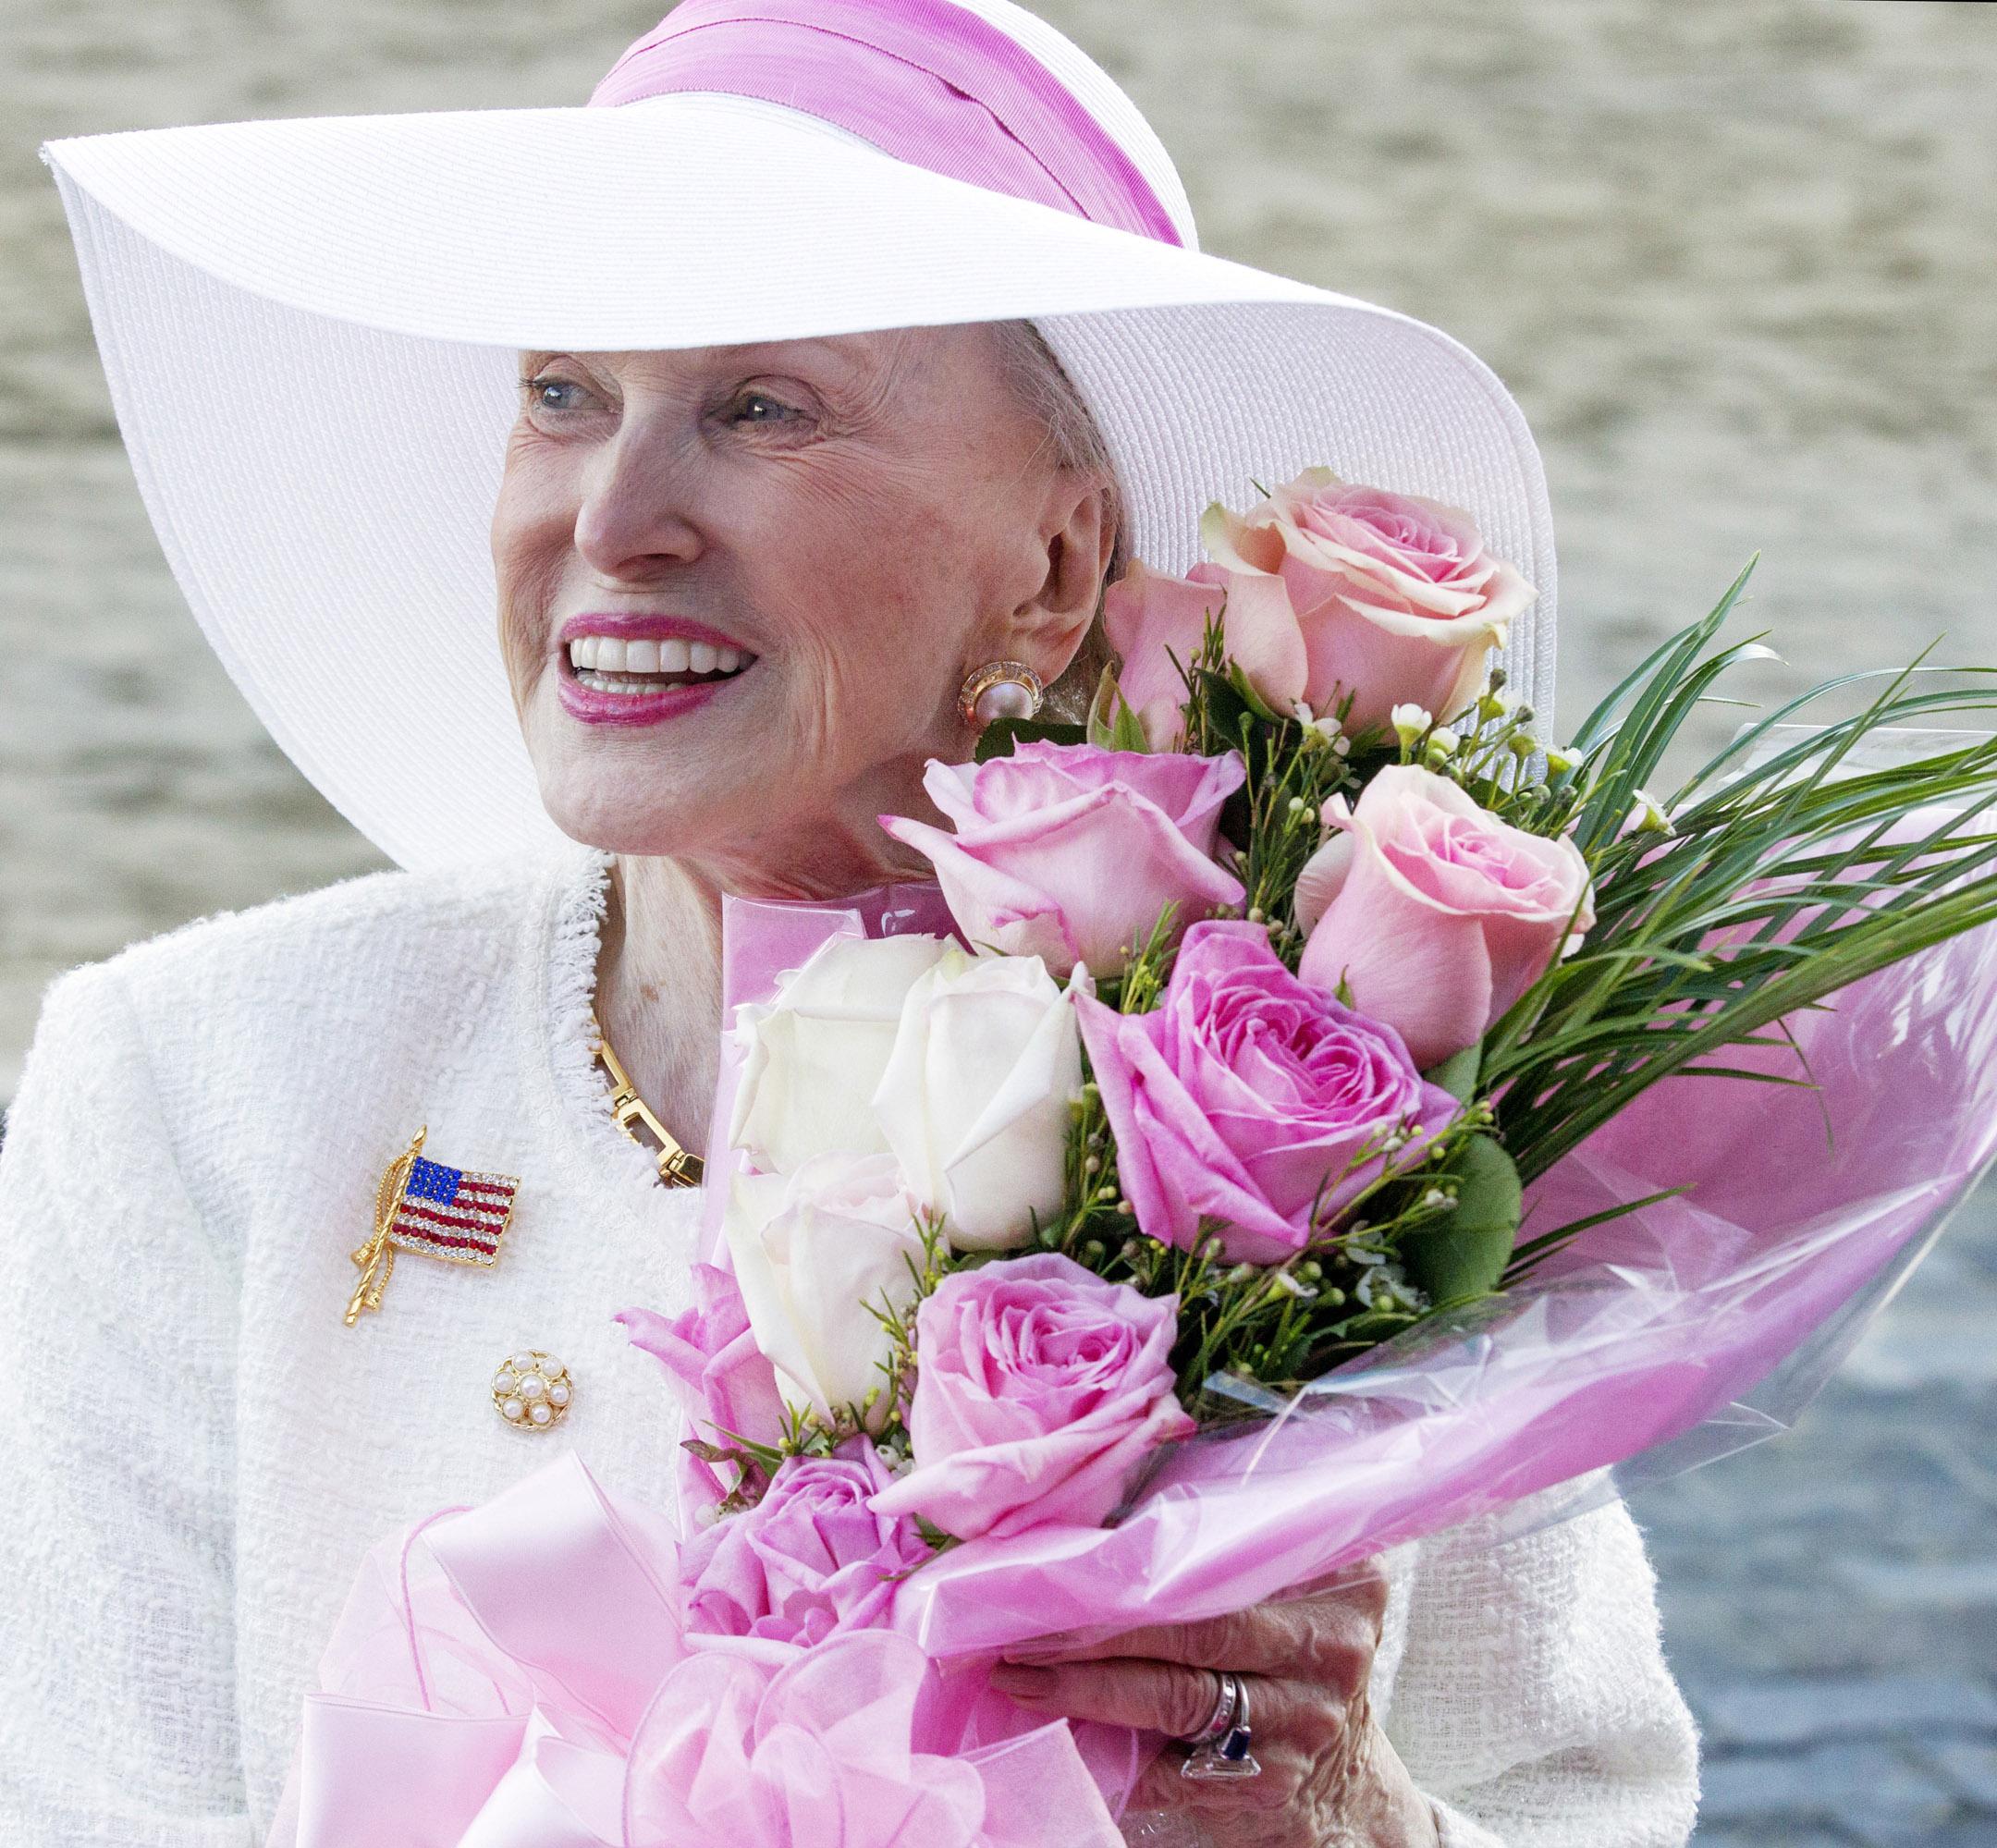 Marylou Whitney at Saratoga, August 2016 (Barbara D. Livingston)